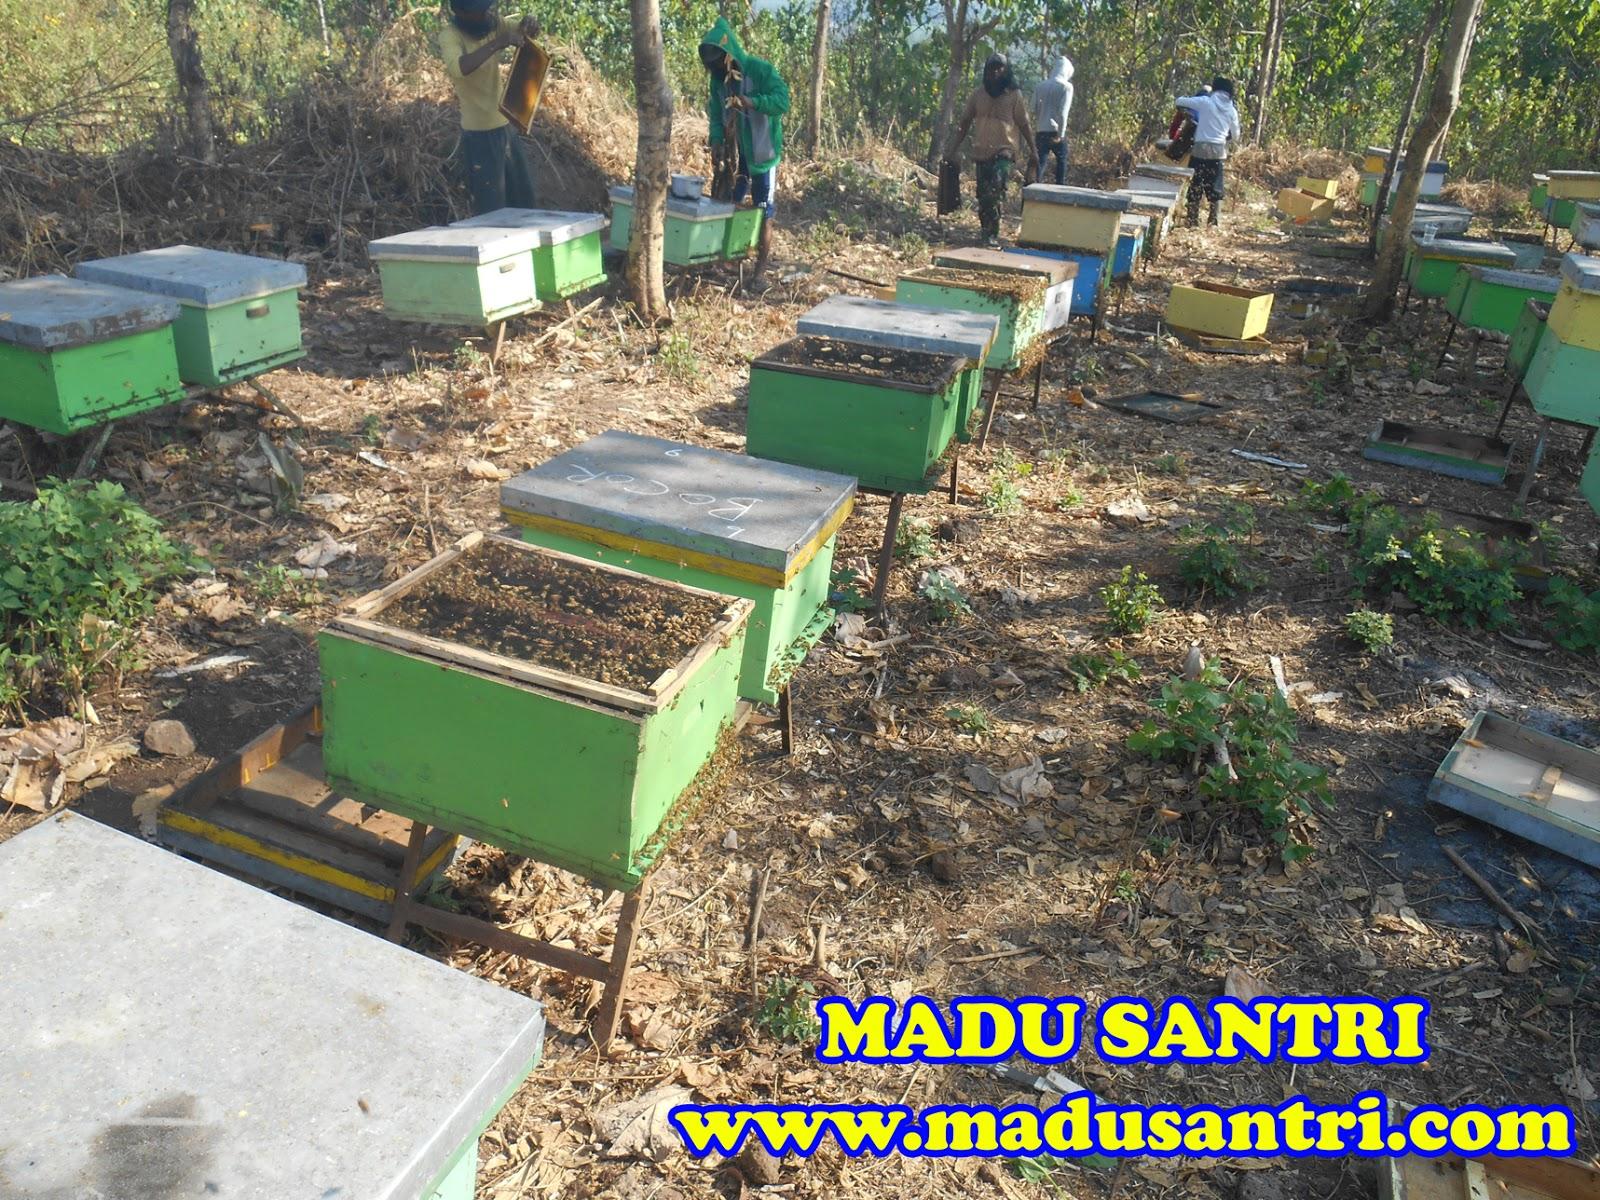 jual madu asli murni alami di magelang grosir madu murni